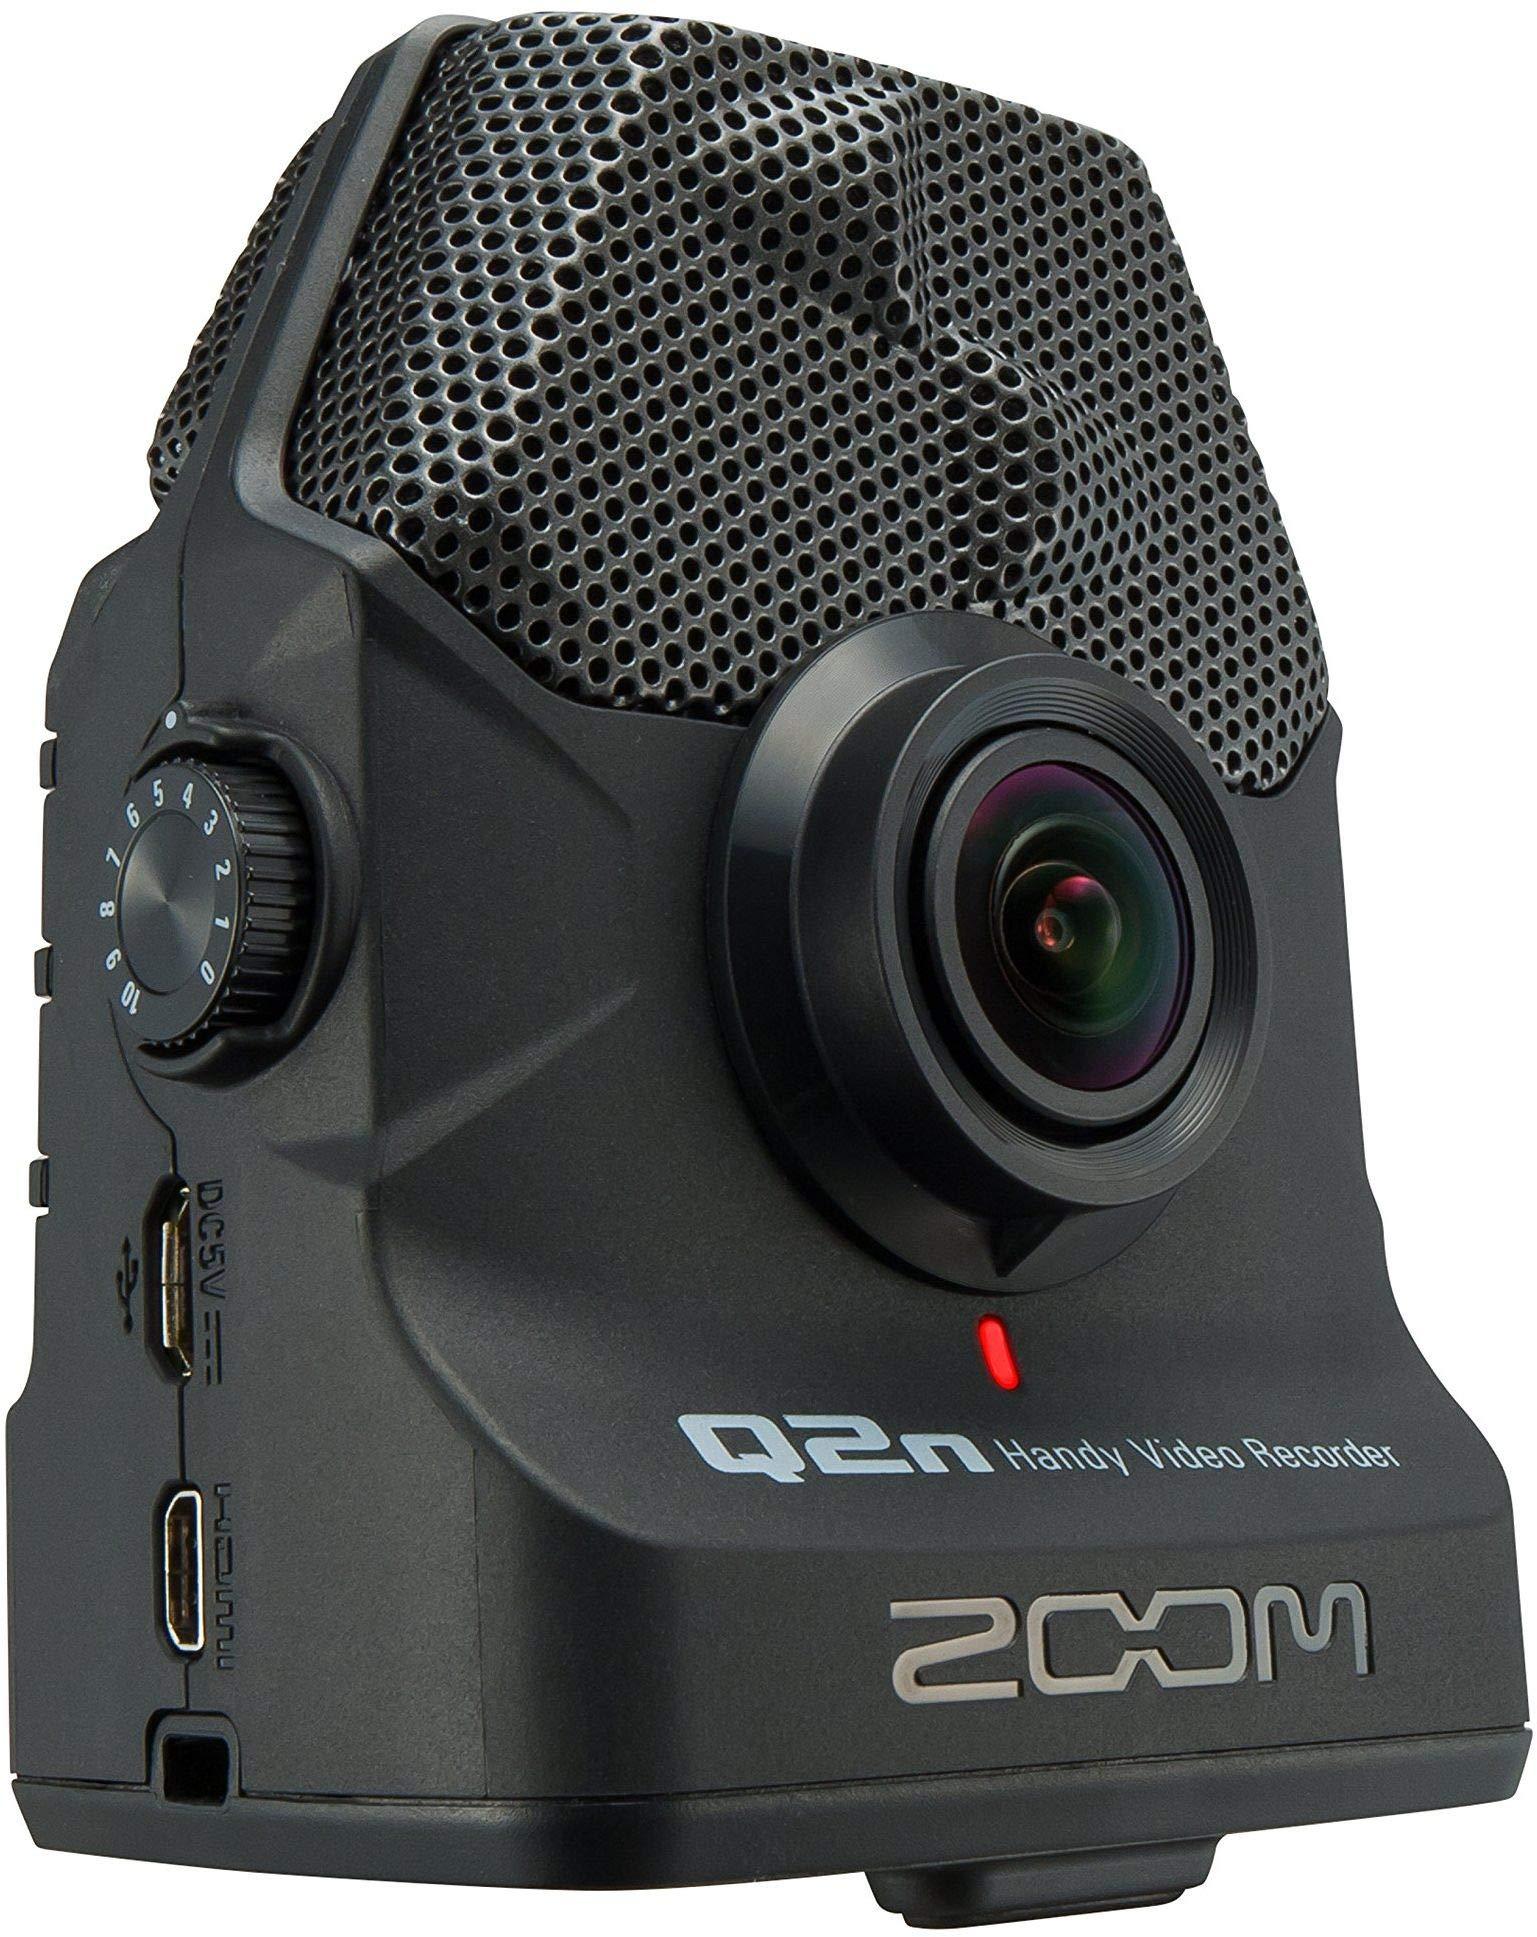 Zoom Q2n Zoom Handy Video Recorder (Black) by Zoom